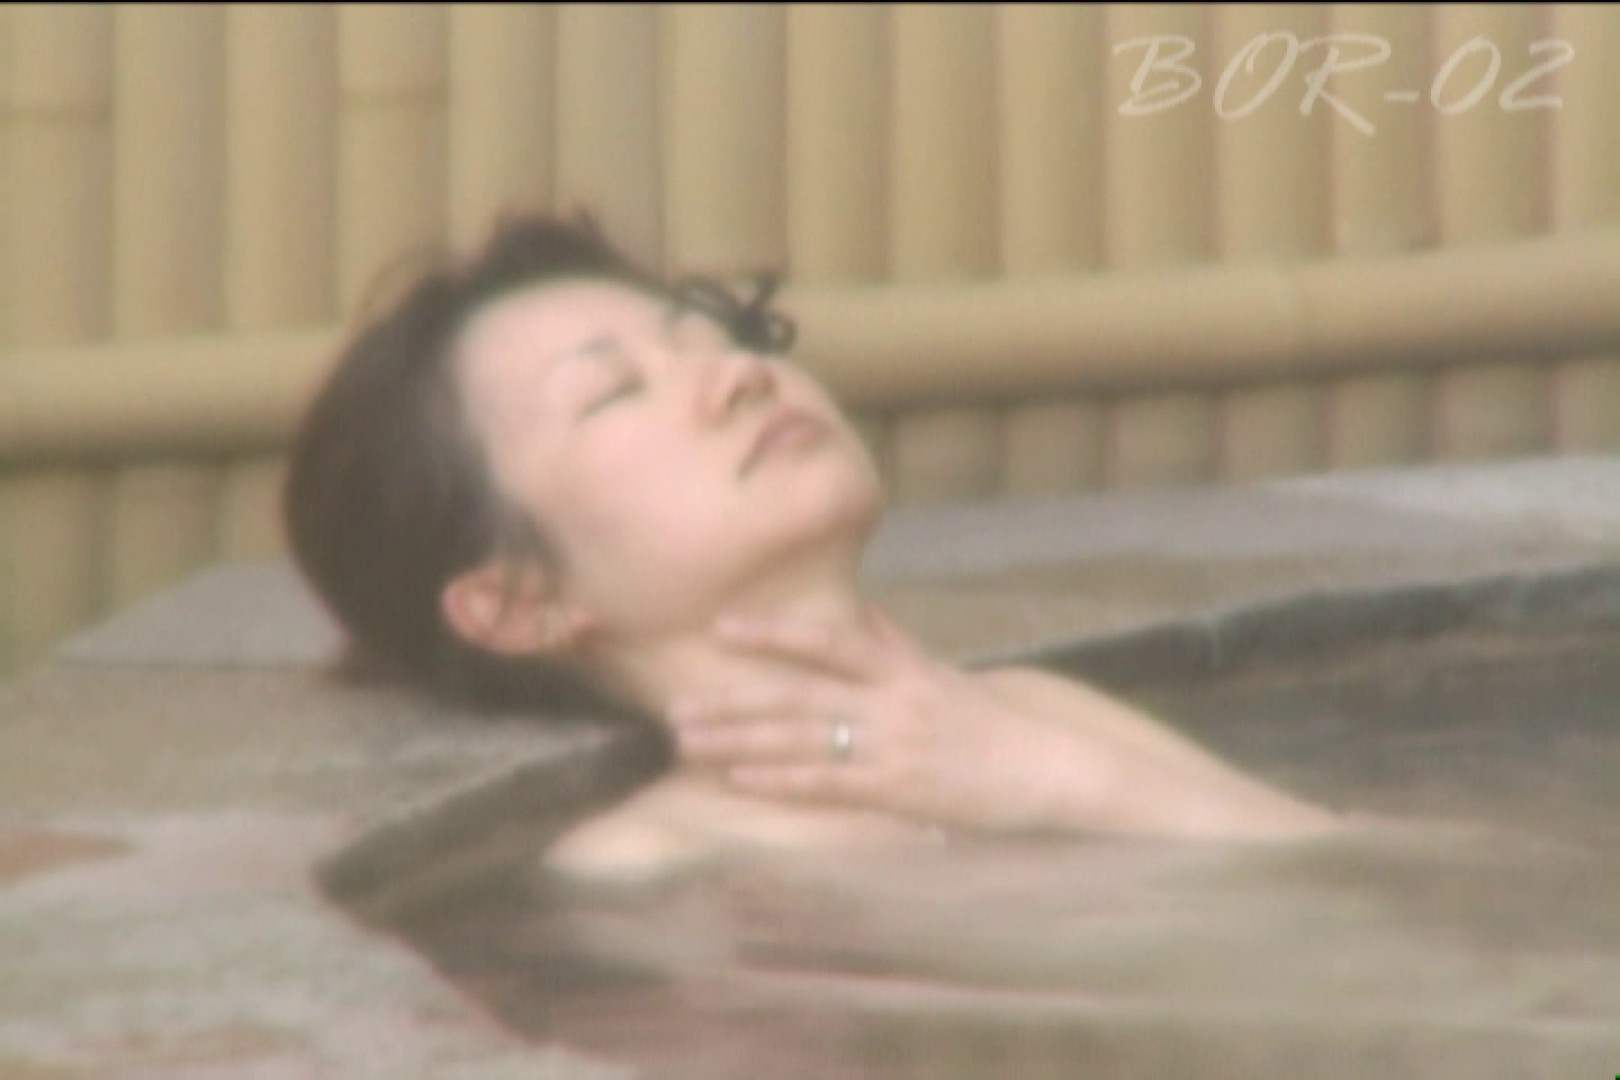 Aquaな露天風呂Vol.477 露天 アダルト動画キャプチャ 99PICs 53